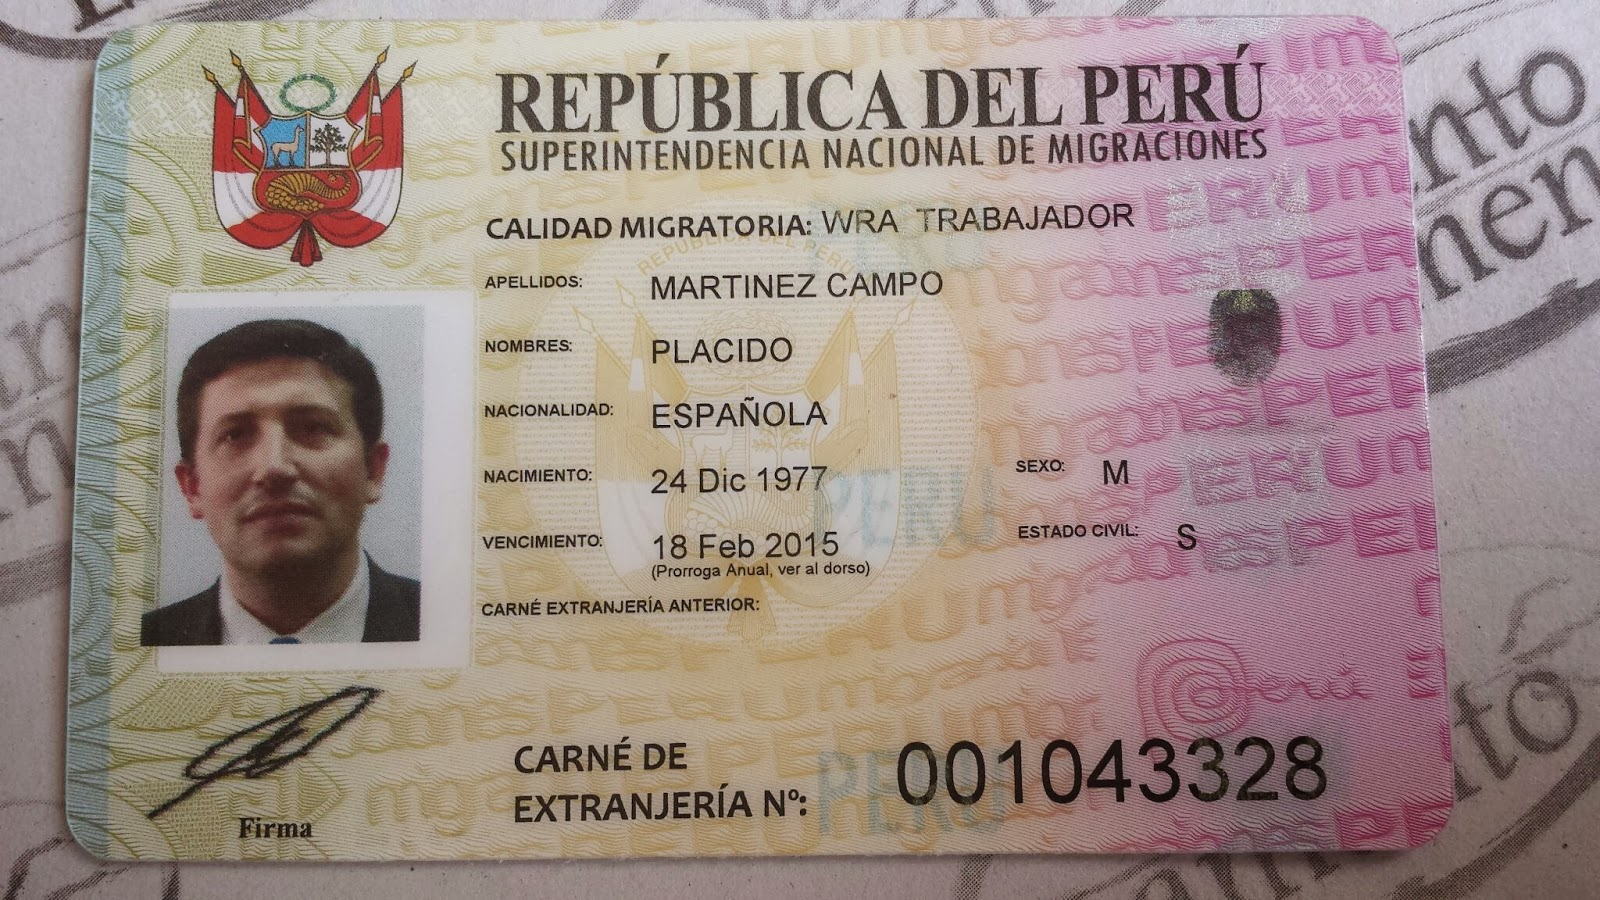 Carnet de Extranjería Peruano